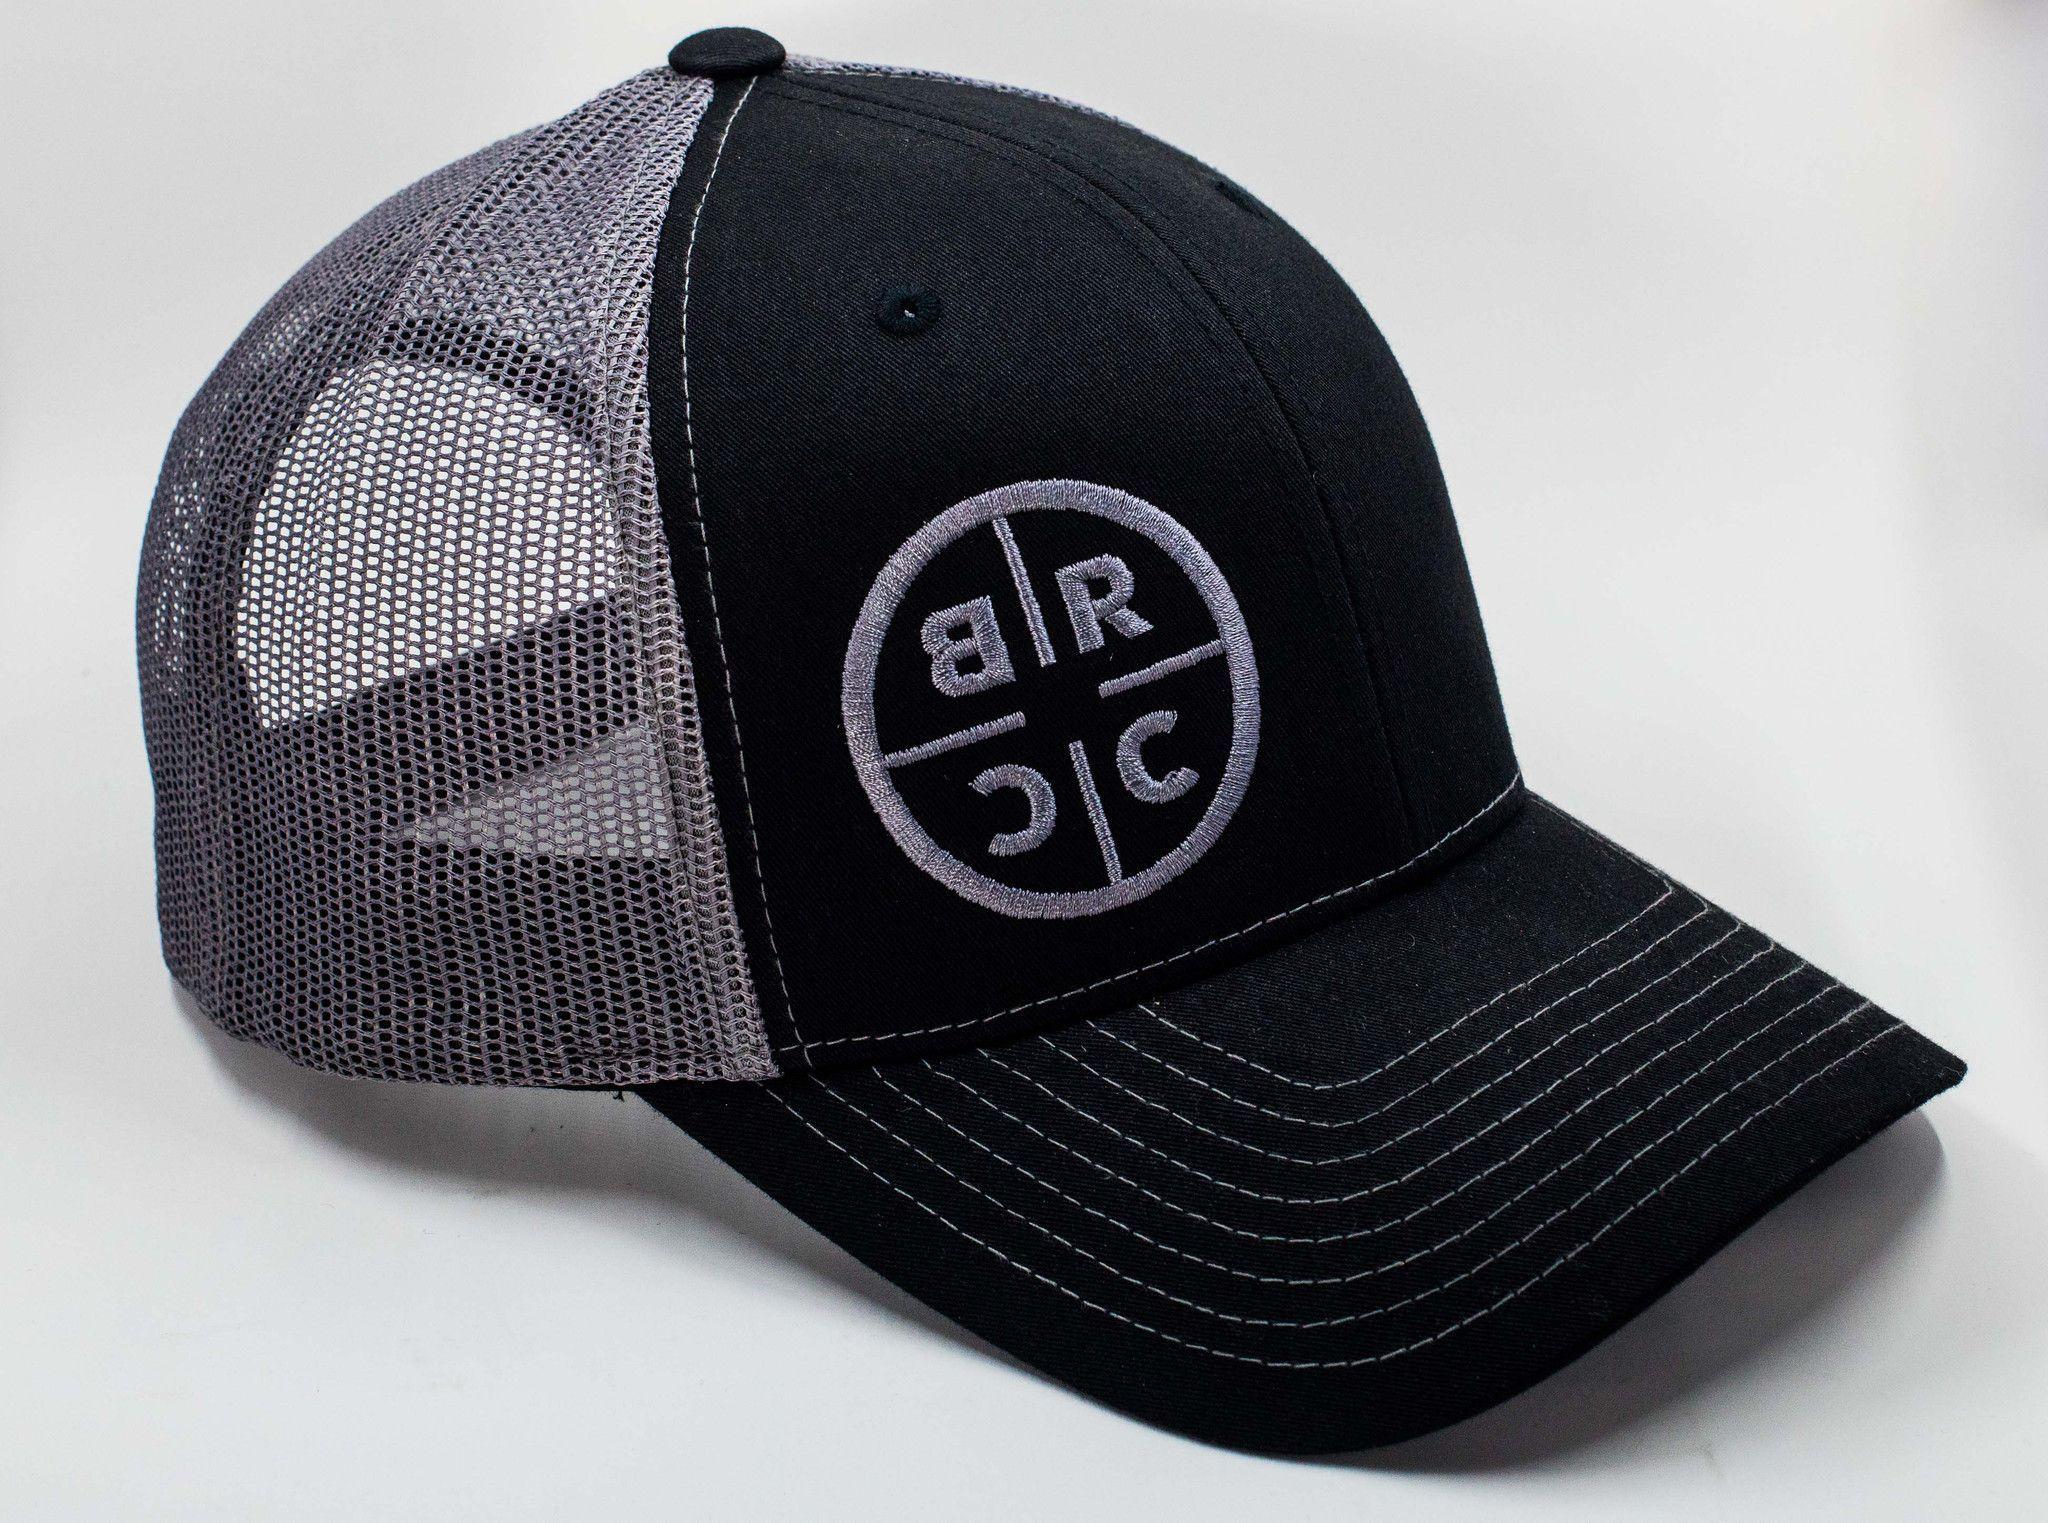 cae42c6aaa71d BRCC Circle Logo Trucker Hat - Black w Grey Mesh